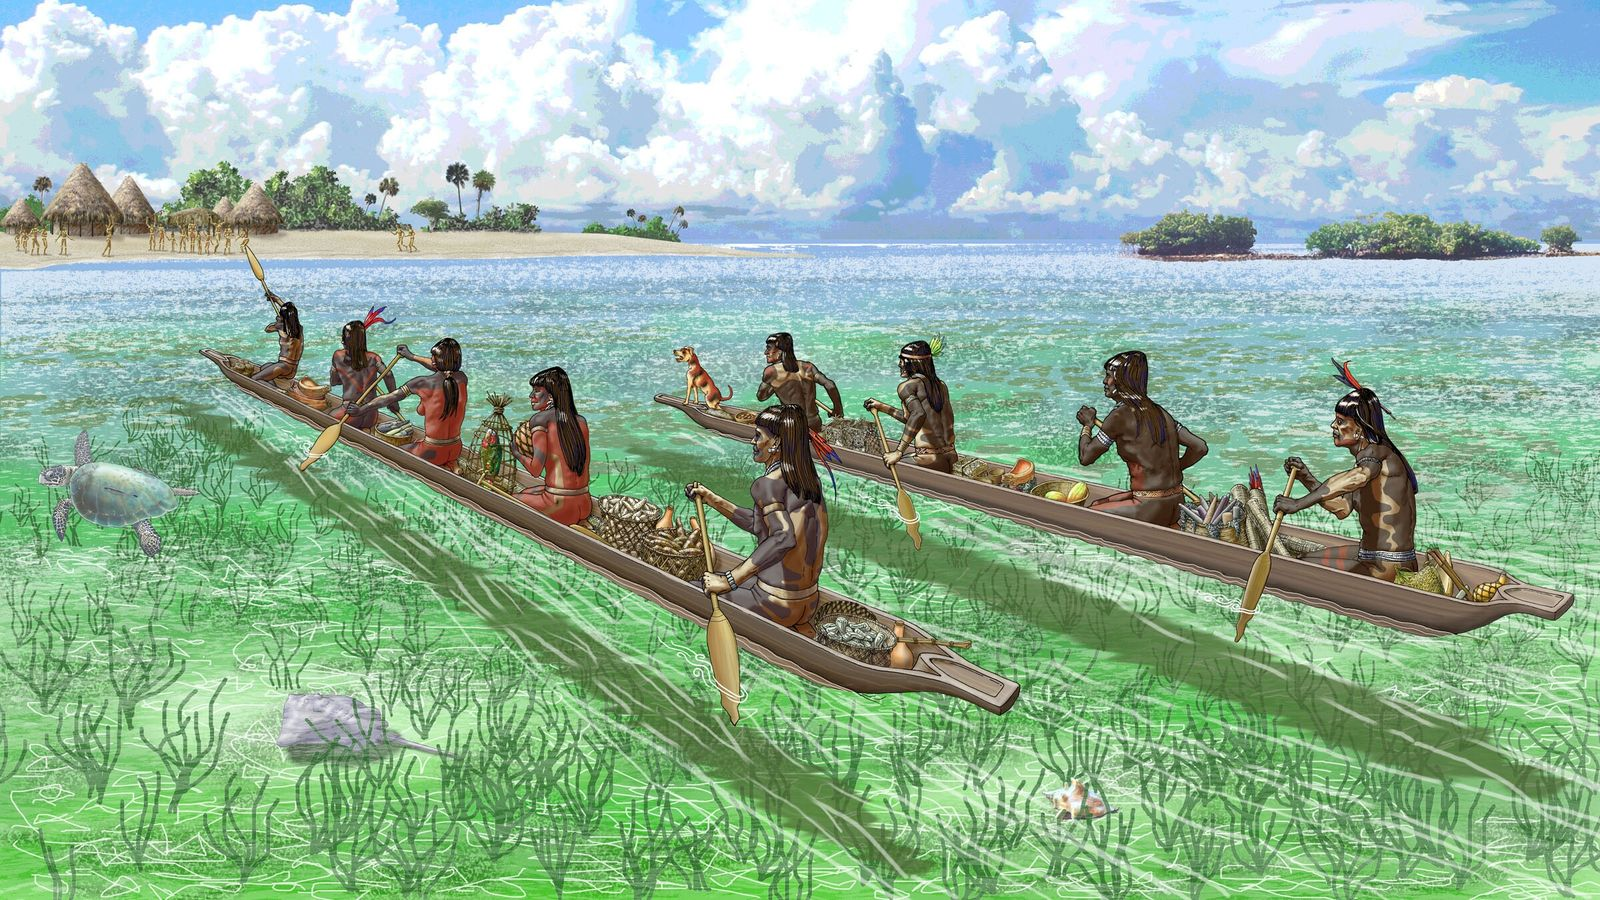 Urbevölkerung der Karibik